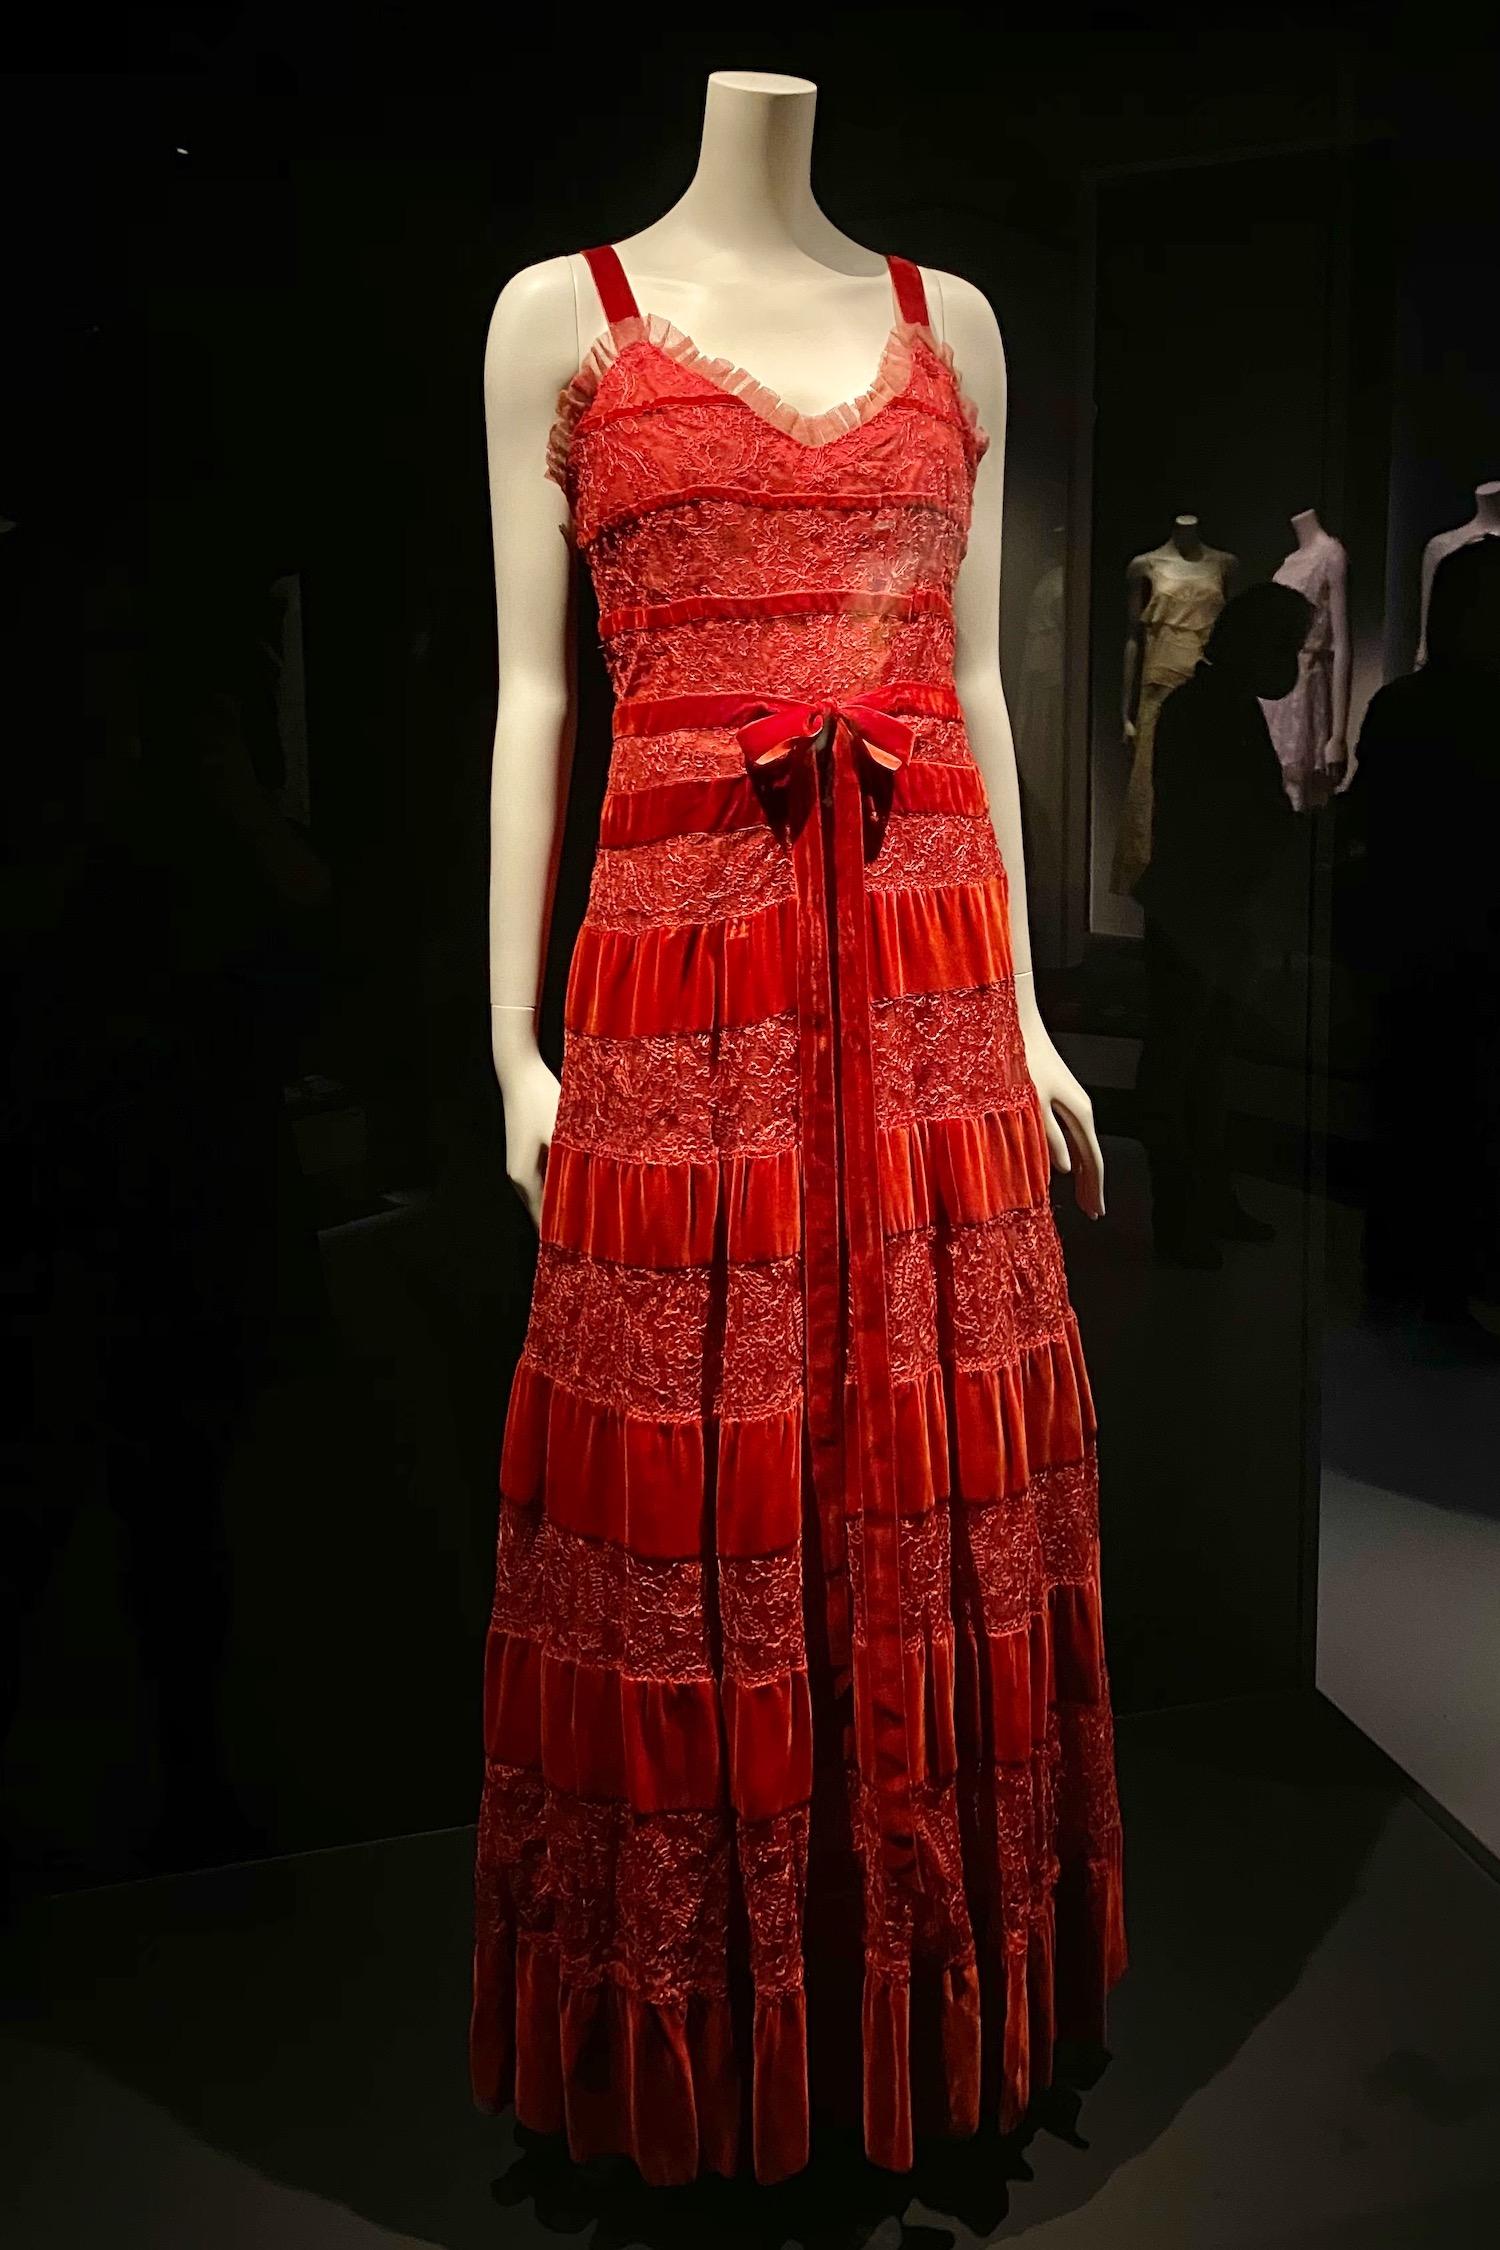 red dress Gabrielle Chanel Fashion Manifesto exhibit